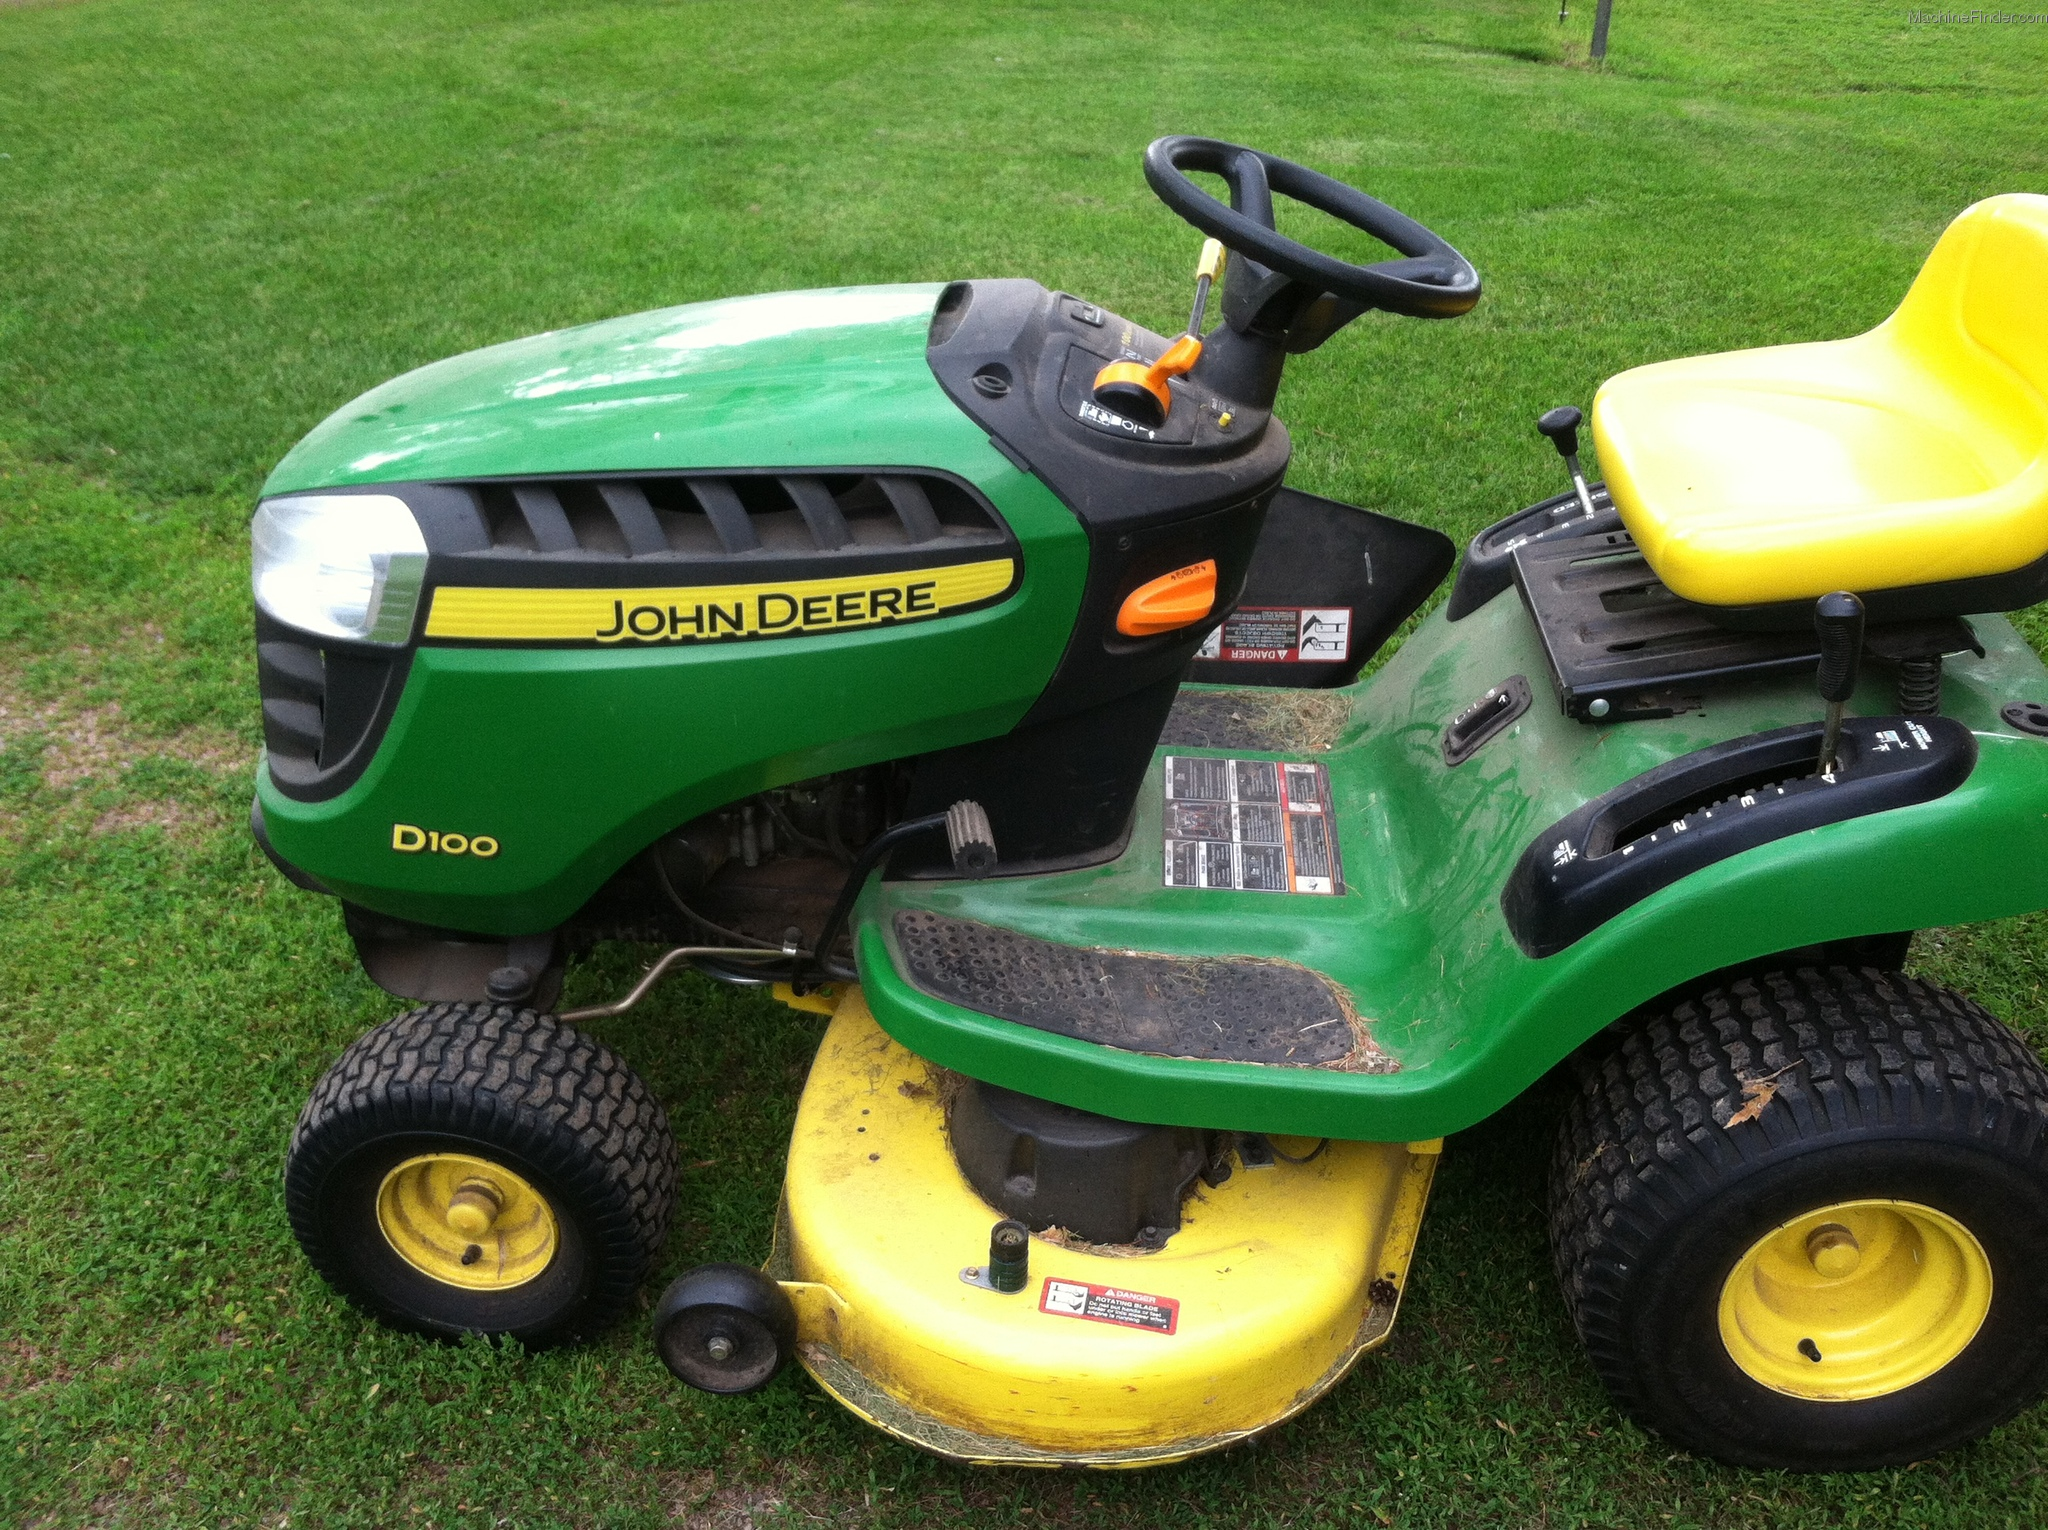 2011 John Deere D100 Lawn Amp Garden And Commercial Mowing border=